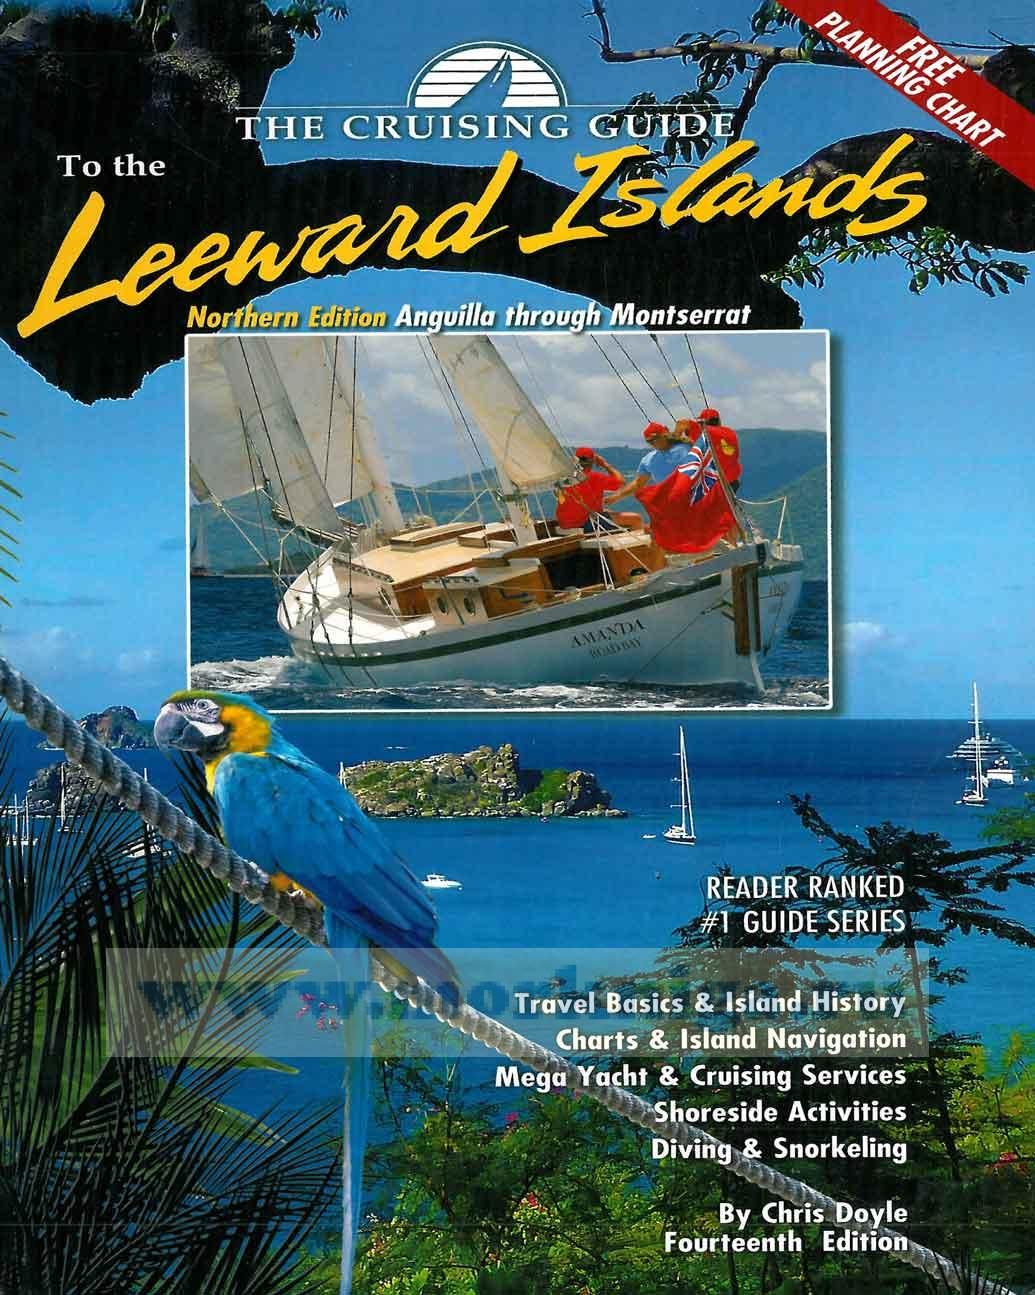 Cruising Guide to Northern Leeward Islands 2016/2017